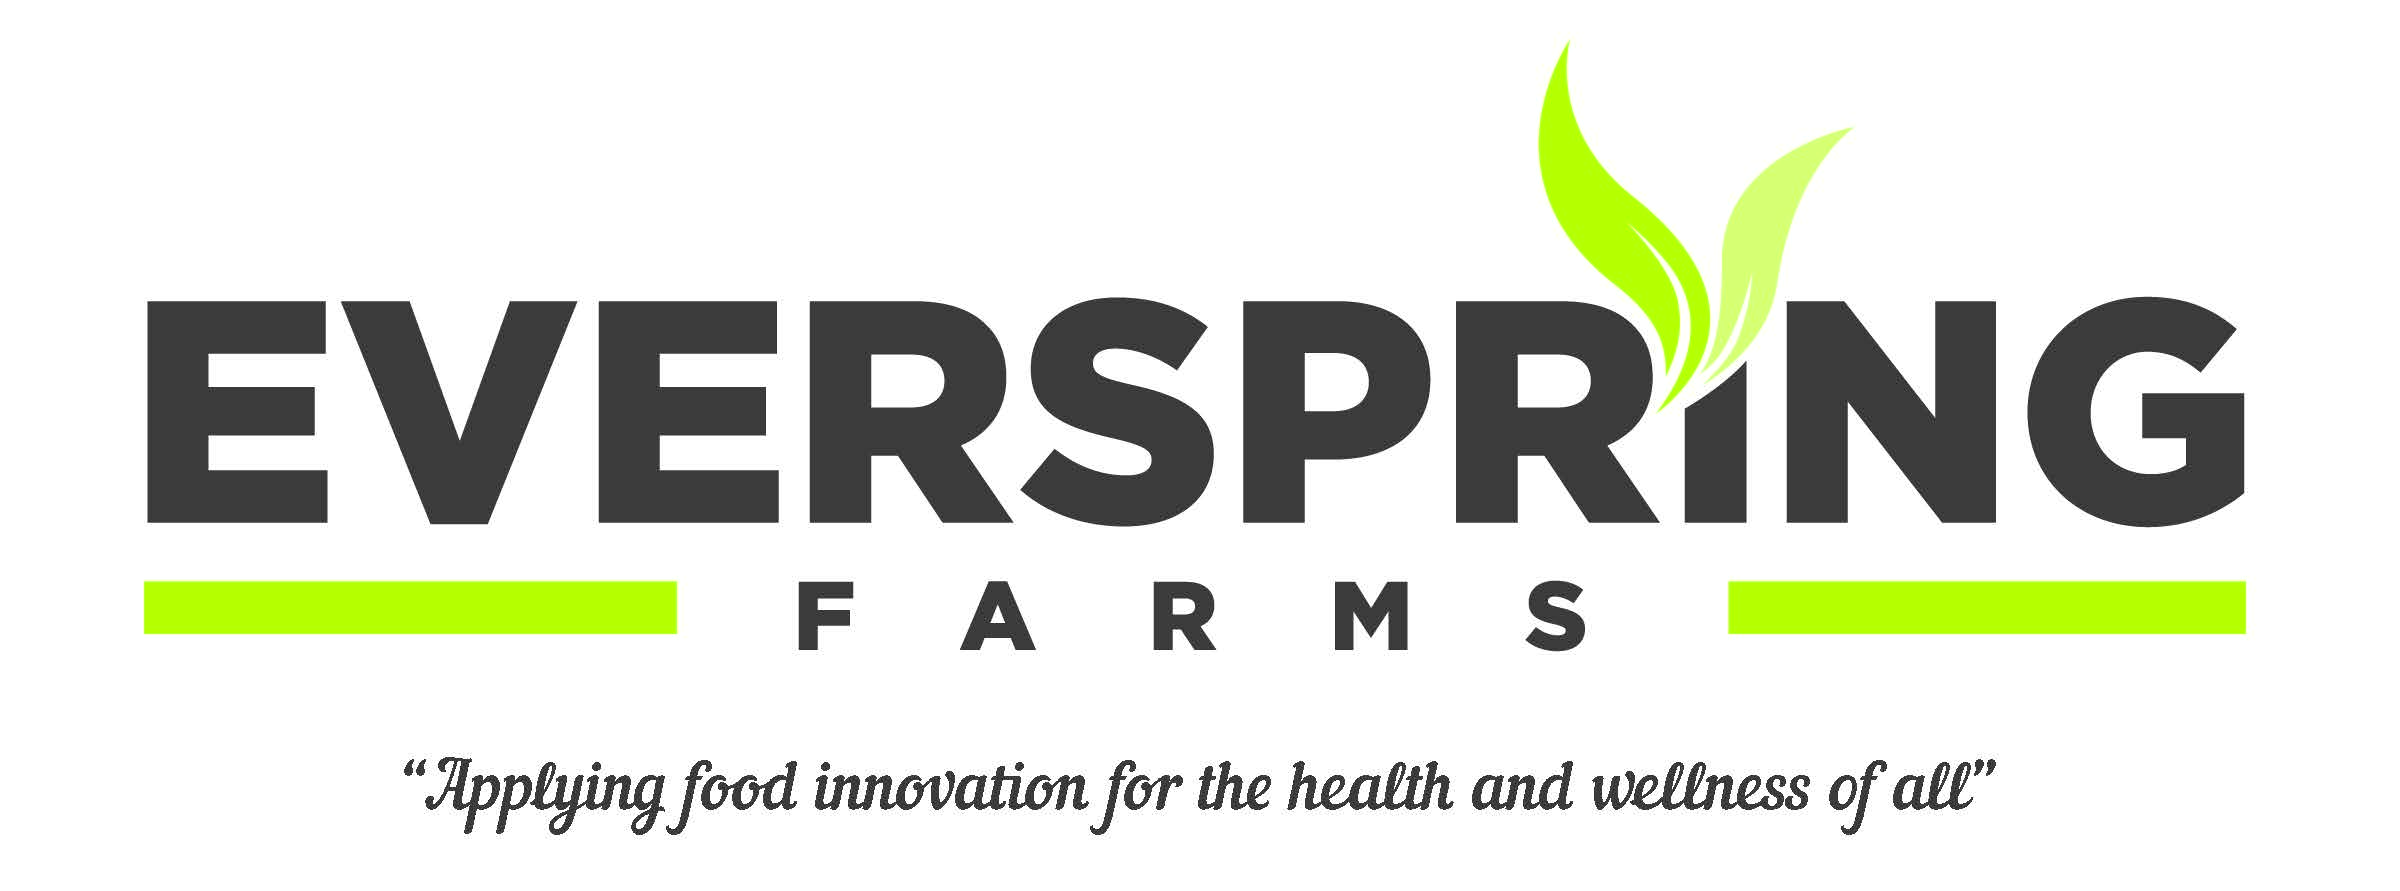 Everspring Farms logo